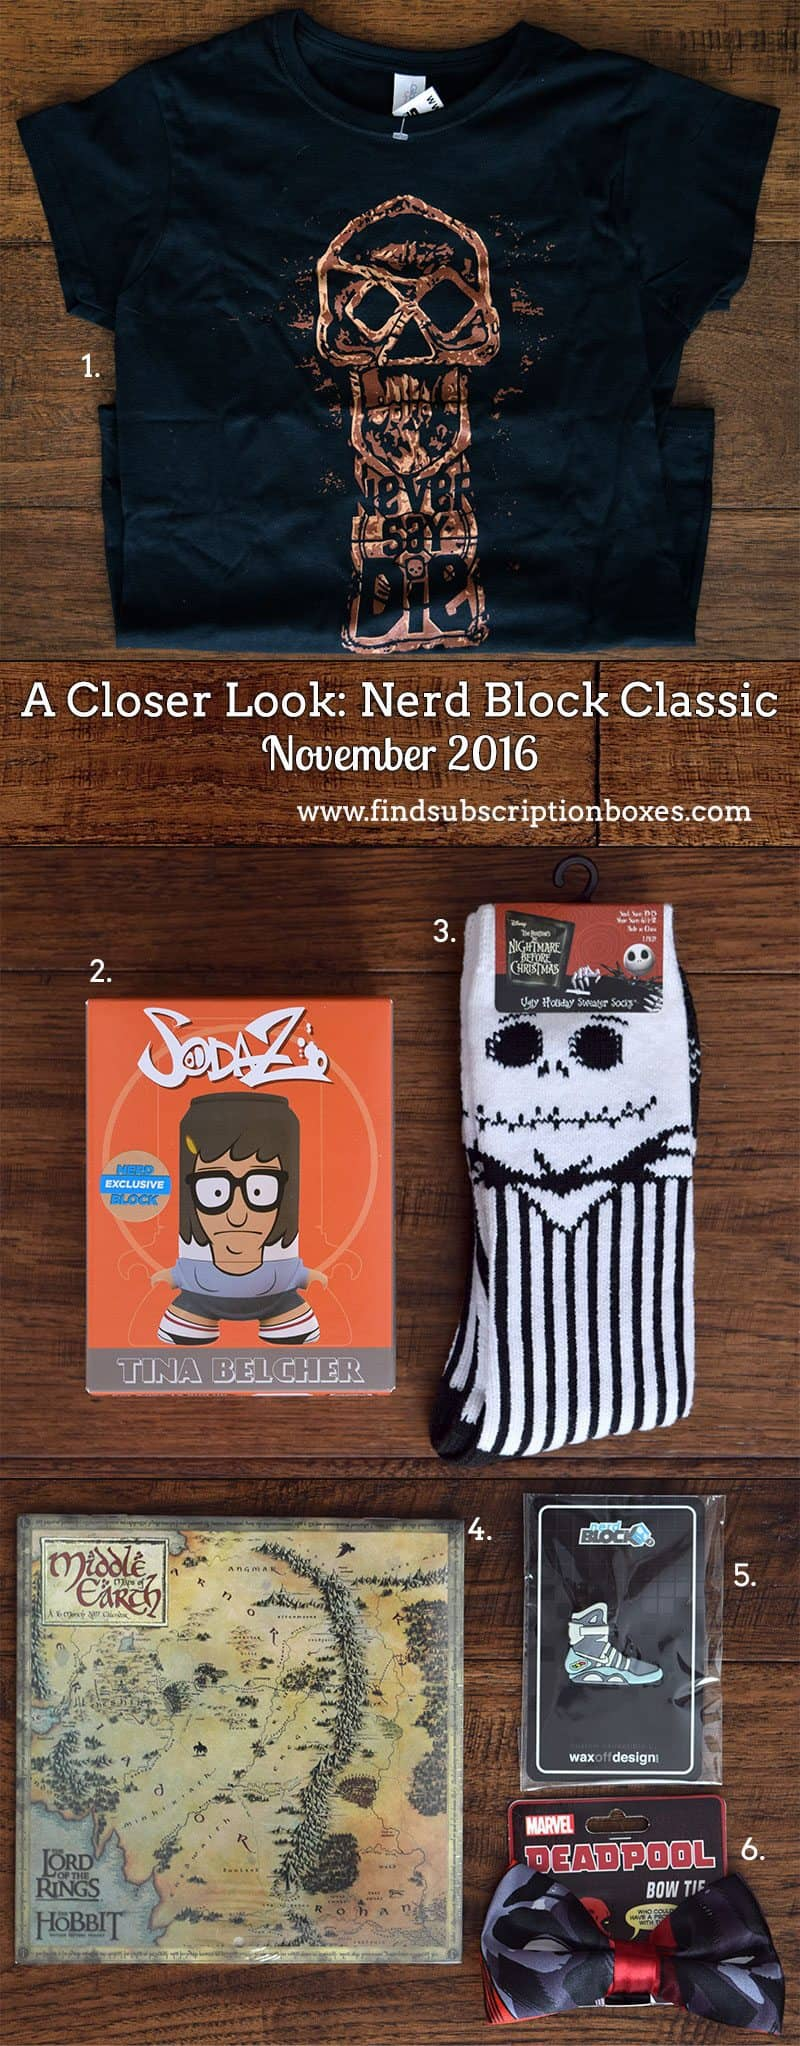 November 2016 Nerd Block Classic Review - Inside the Box